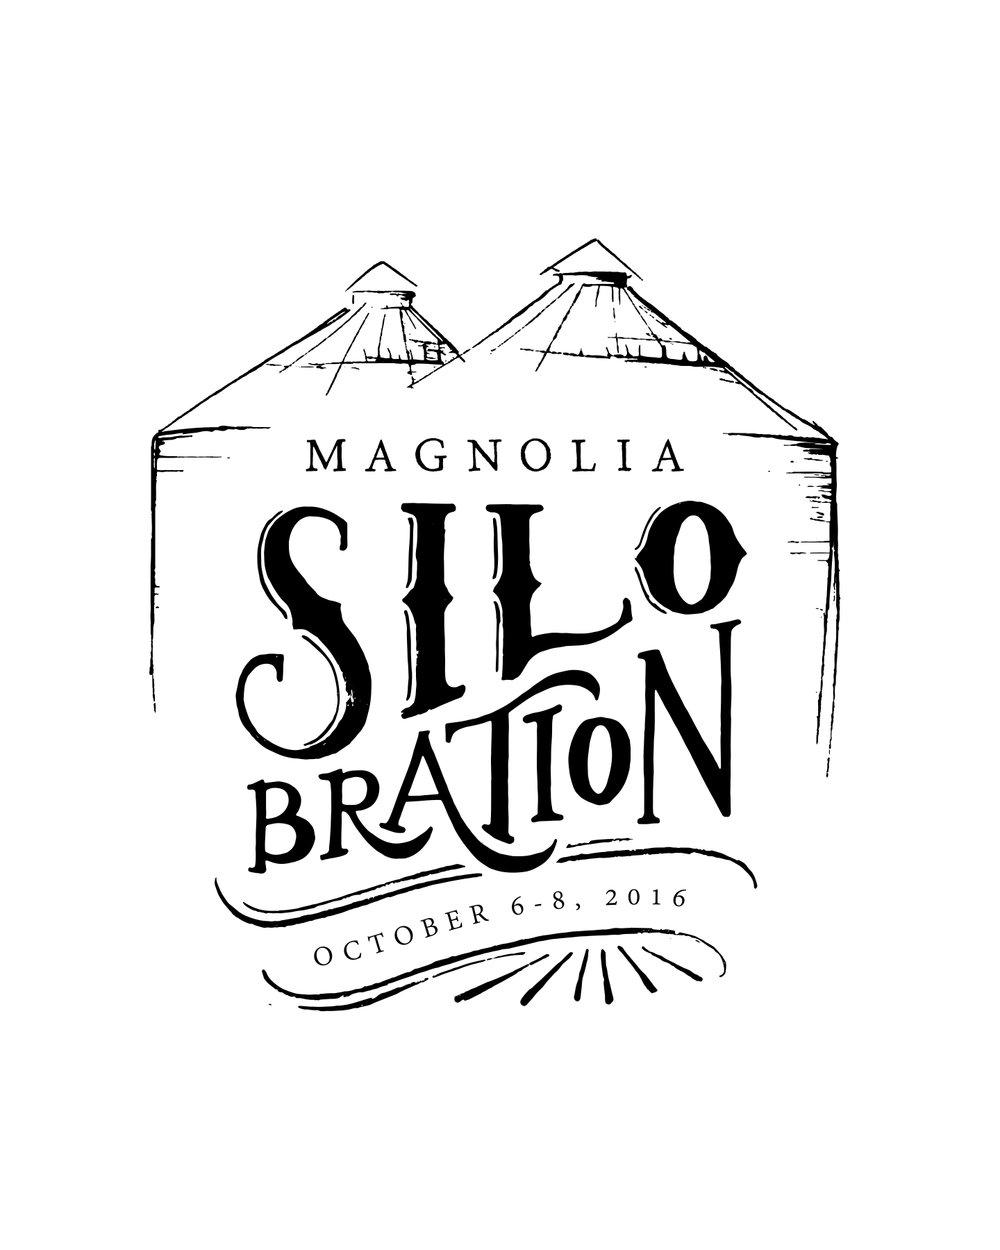 Silobration-JPG.jpg